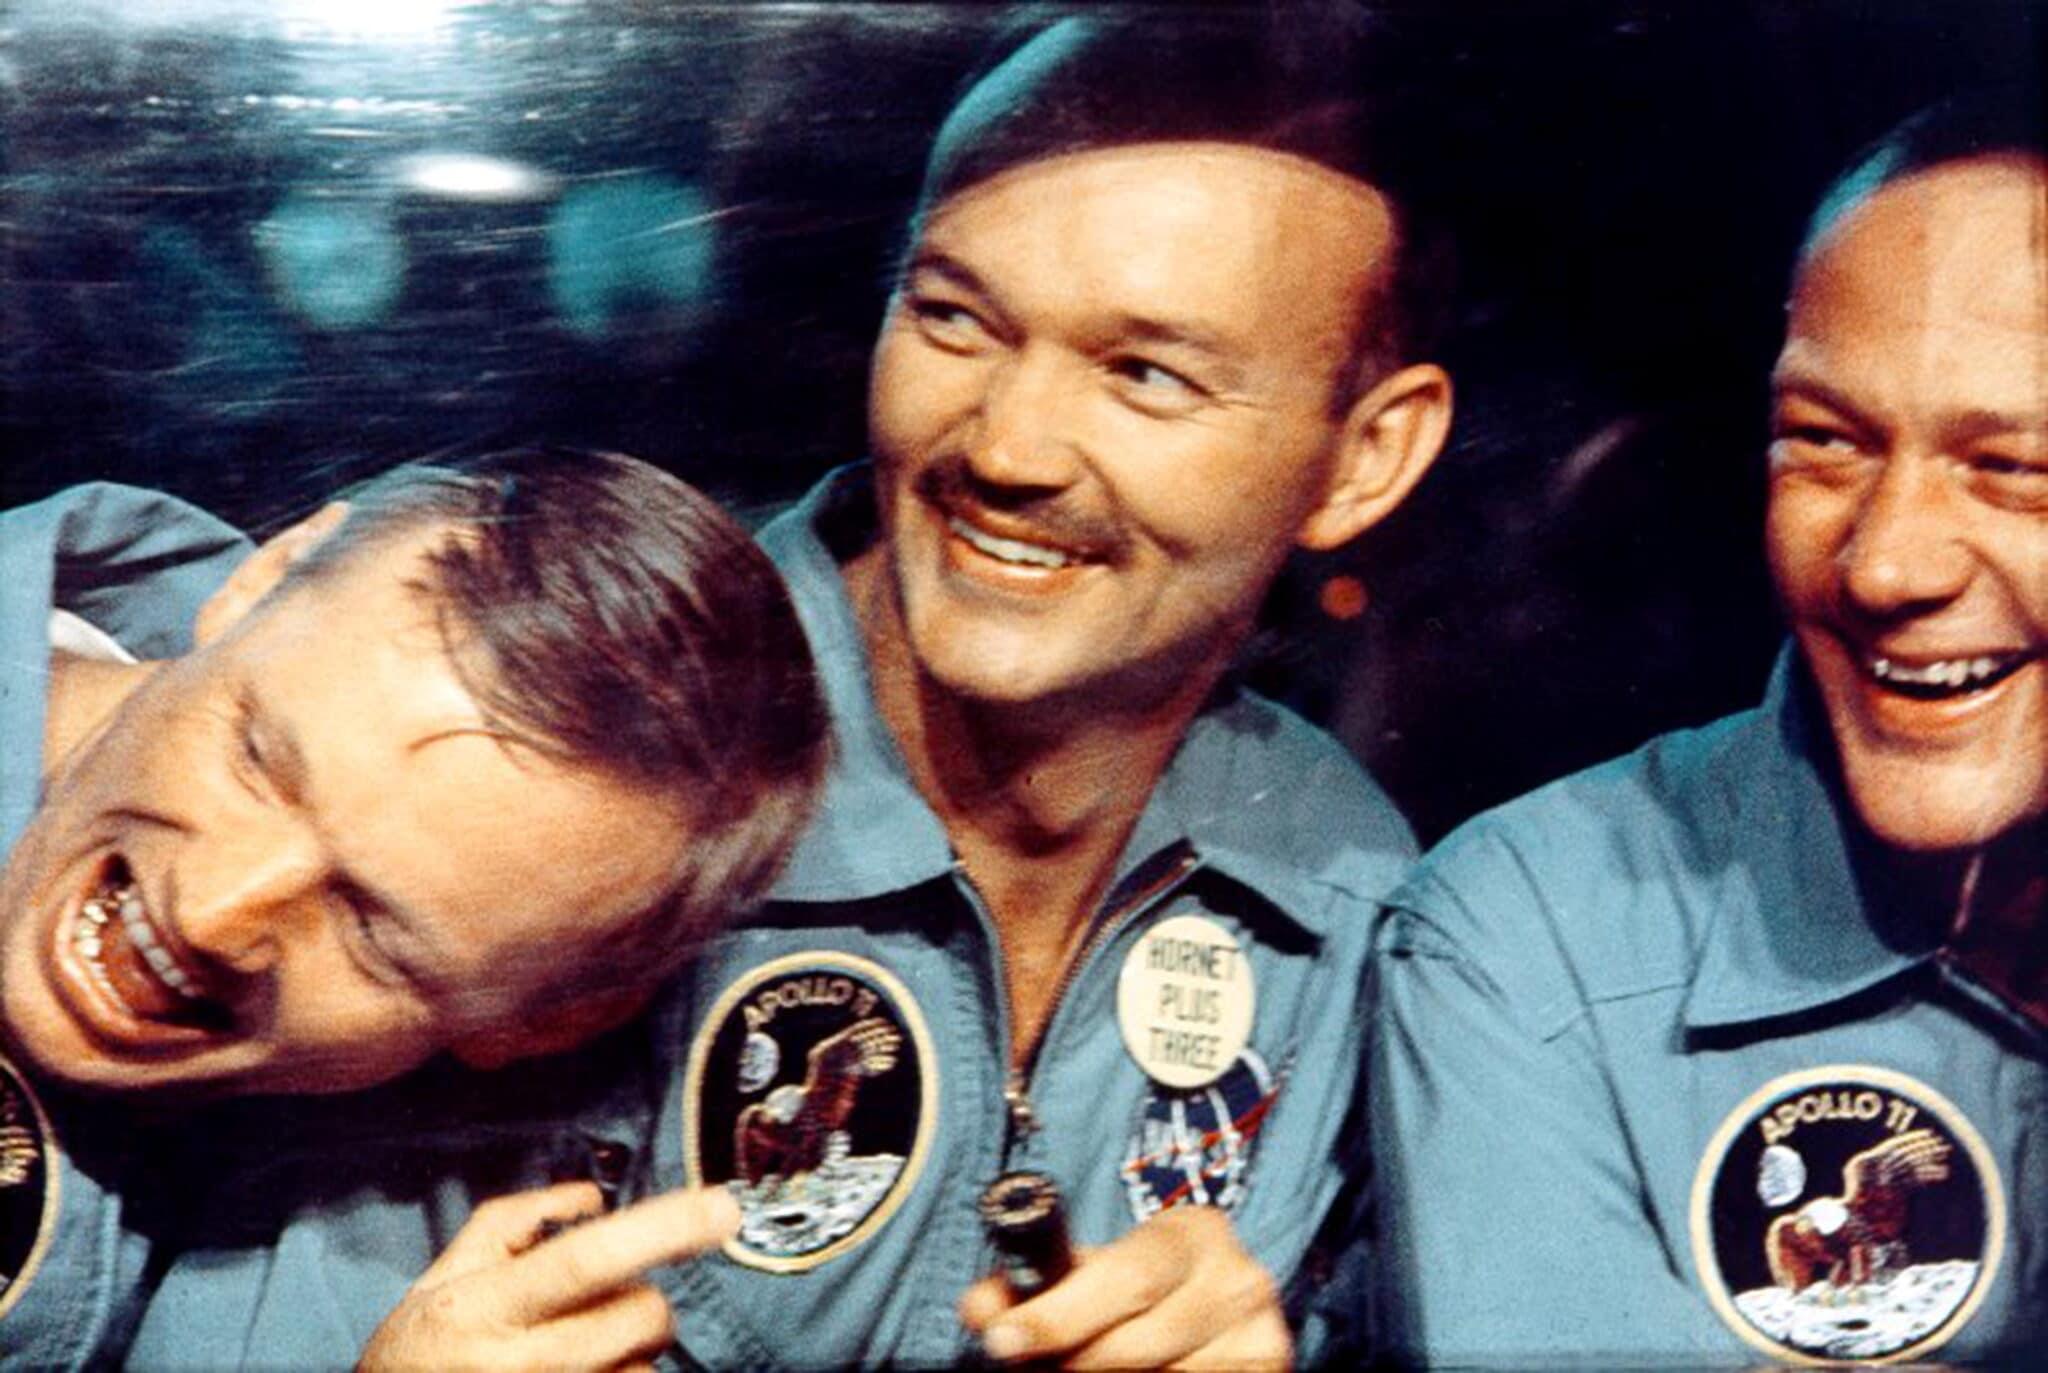 Zemřel Michael Collins, člen posádky Apolla 11